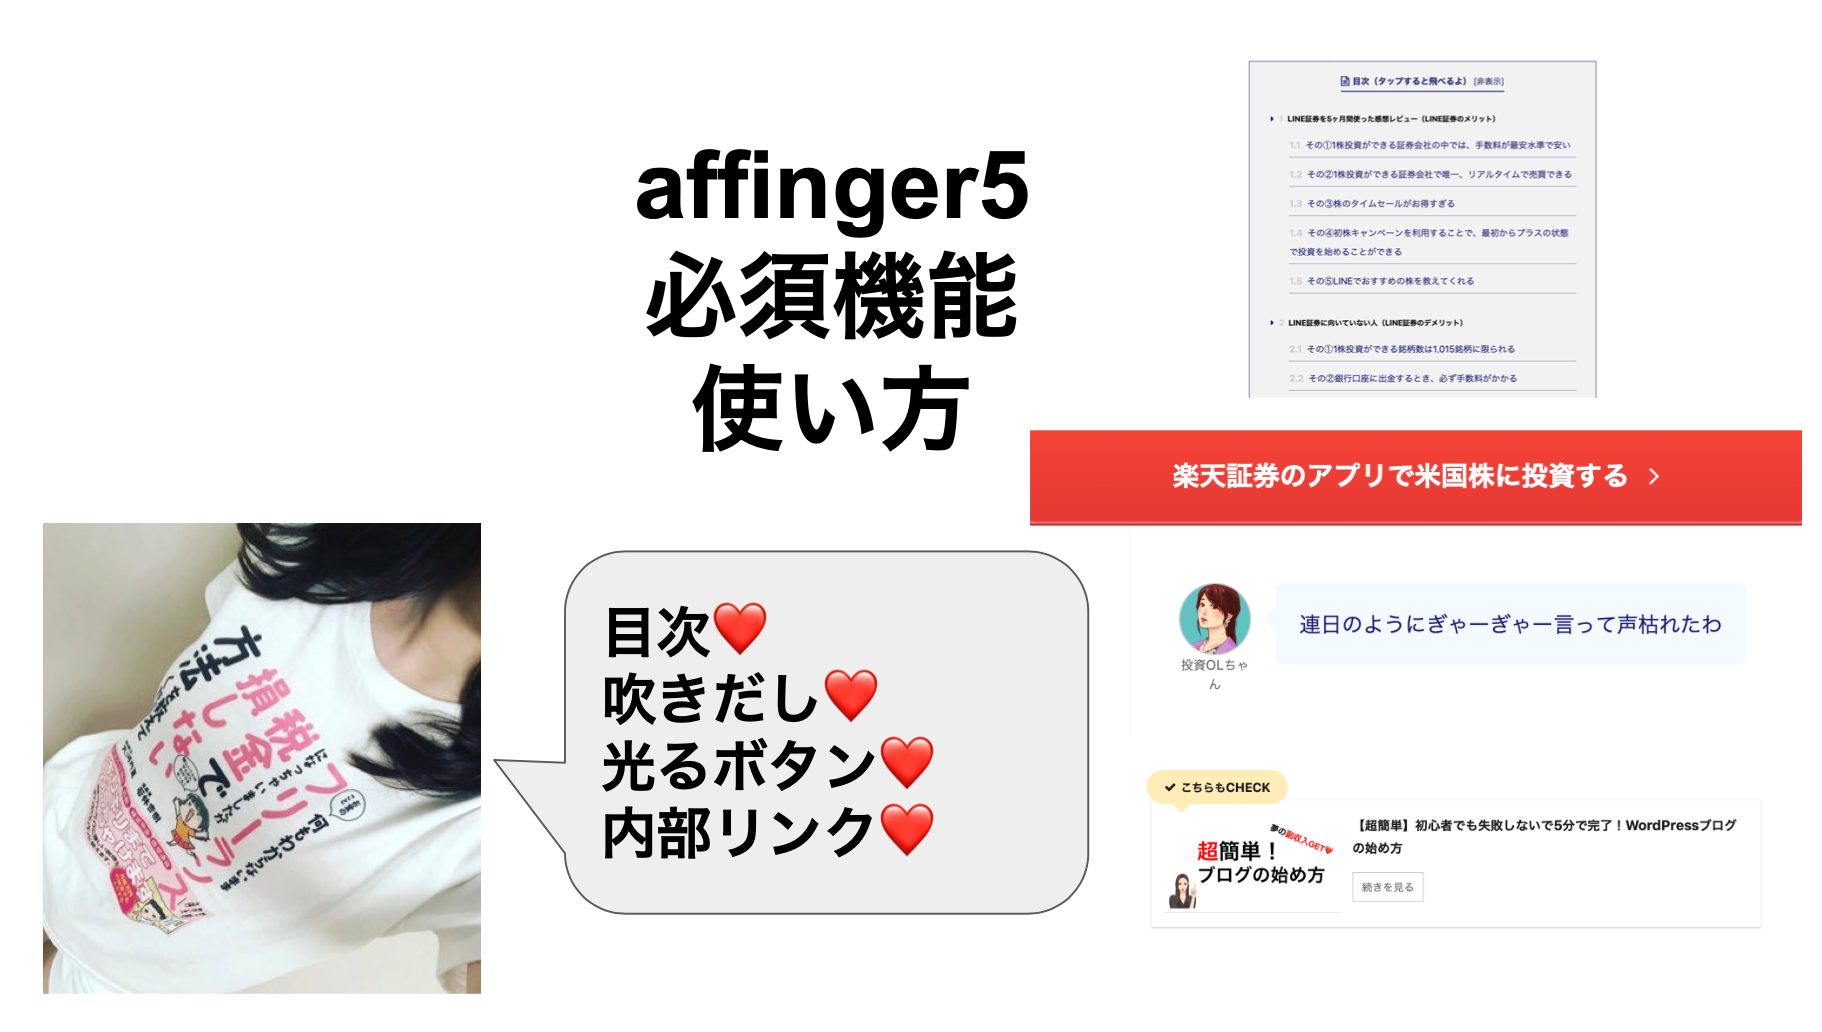 affinger5 機能